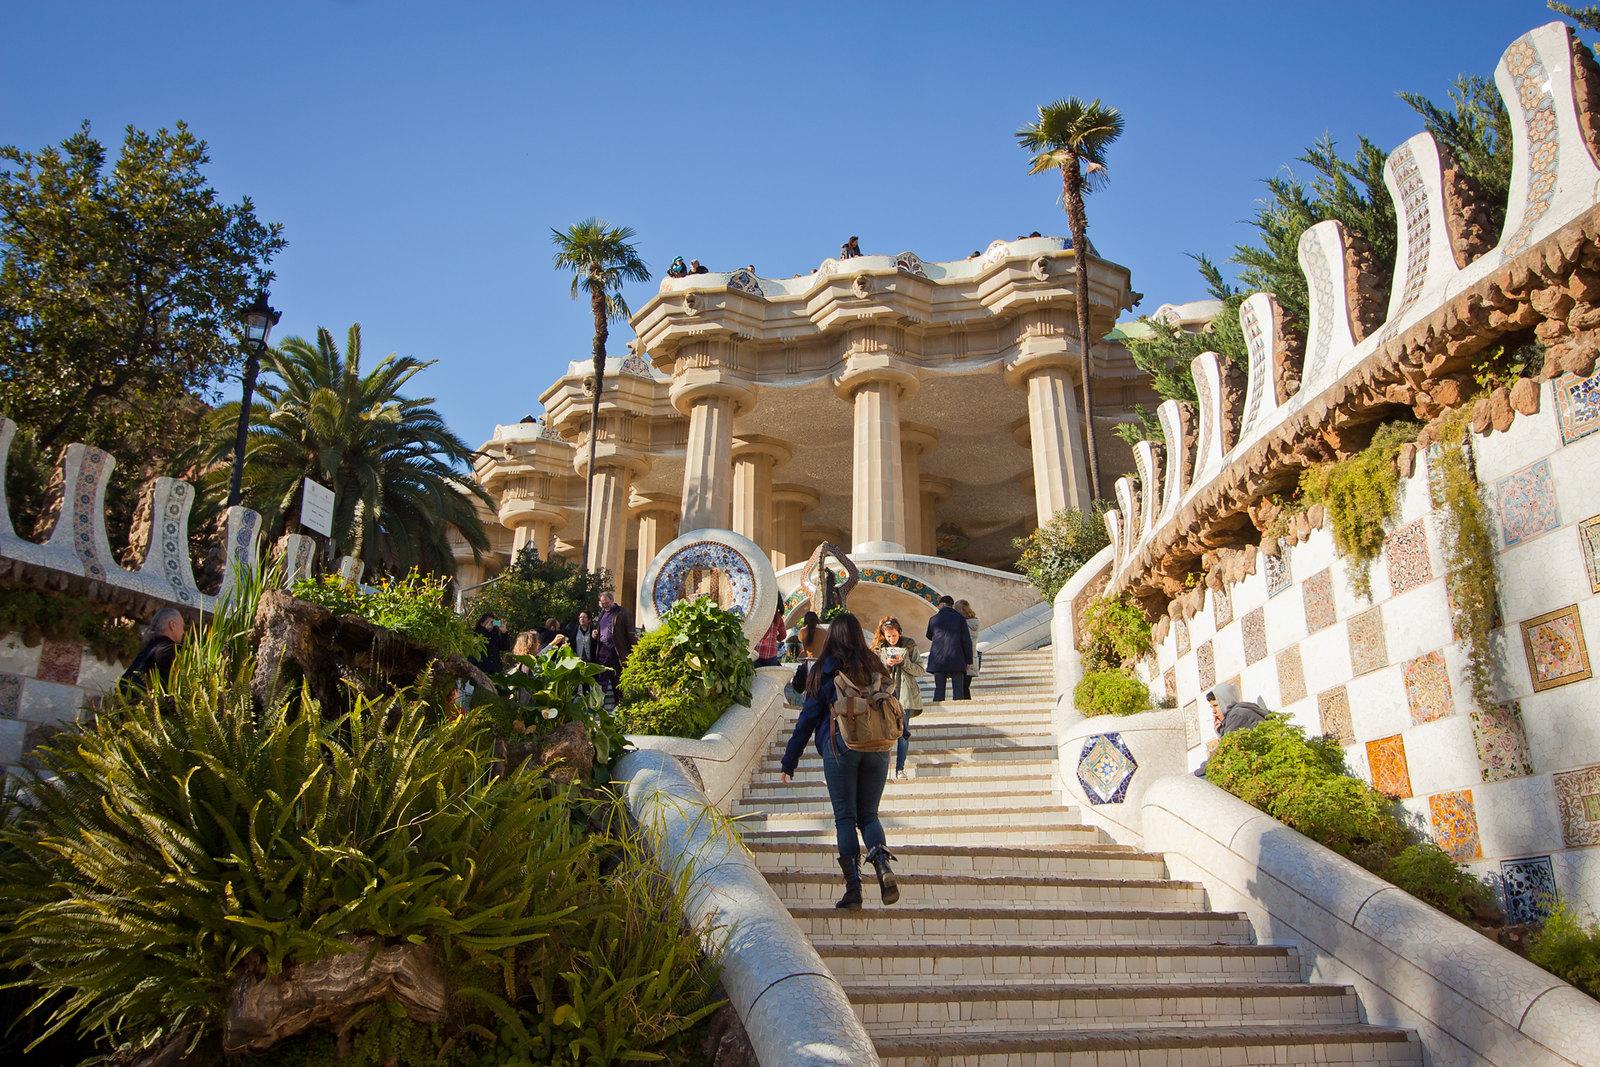 garden, park, europe, travel, spain